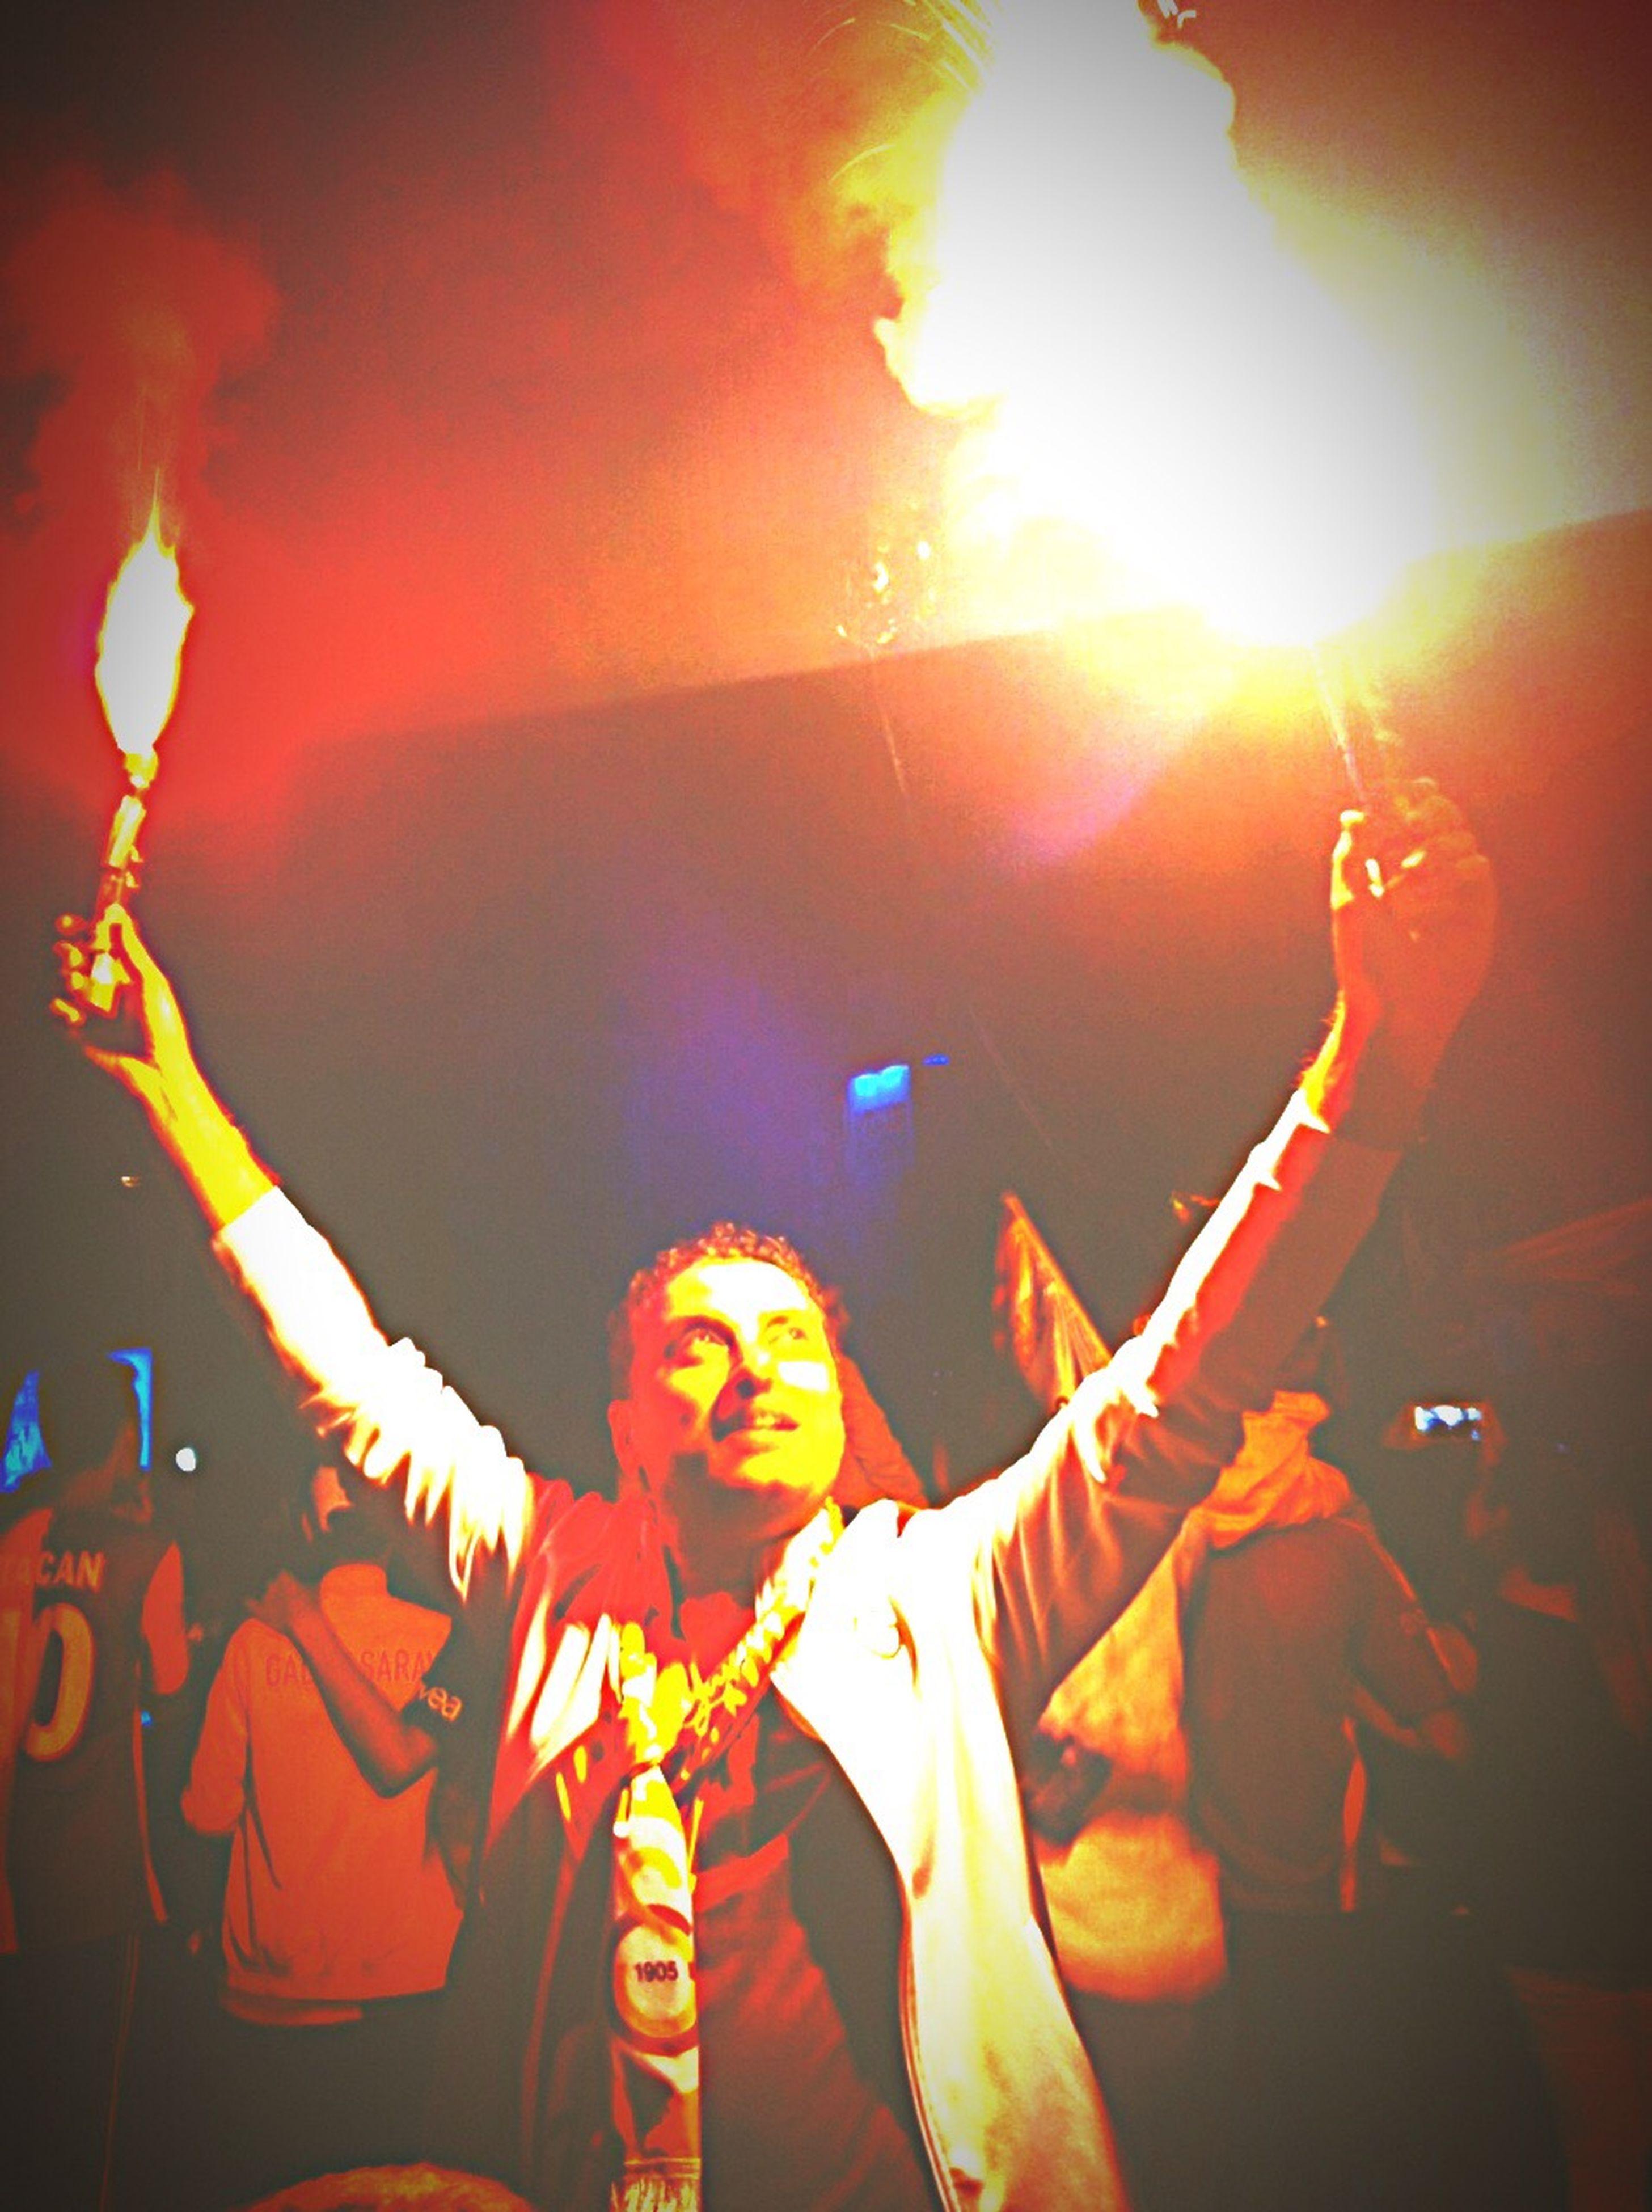 lens flare, sun, sunbeam, illuminated, burning, leisure activity, arts culture and entertainment, orange color, celebration, sky, enjoyment, glowing, flame, sunset, lifestyles, men, sunlight, low angle view, fun